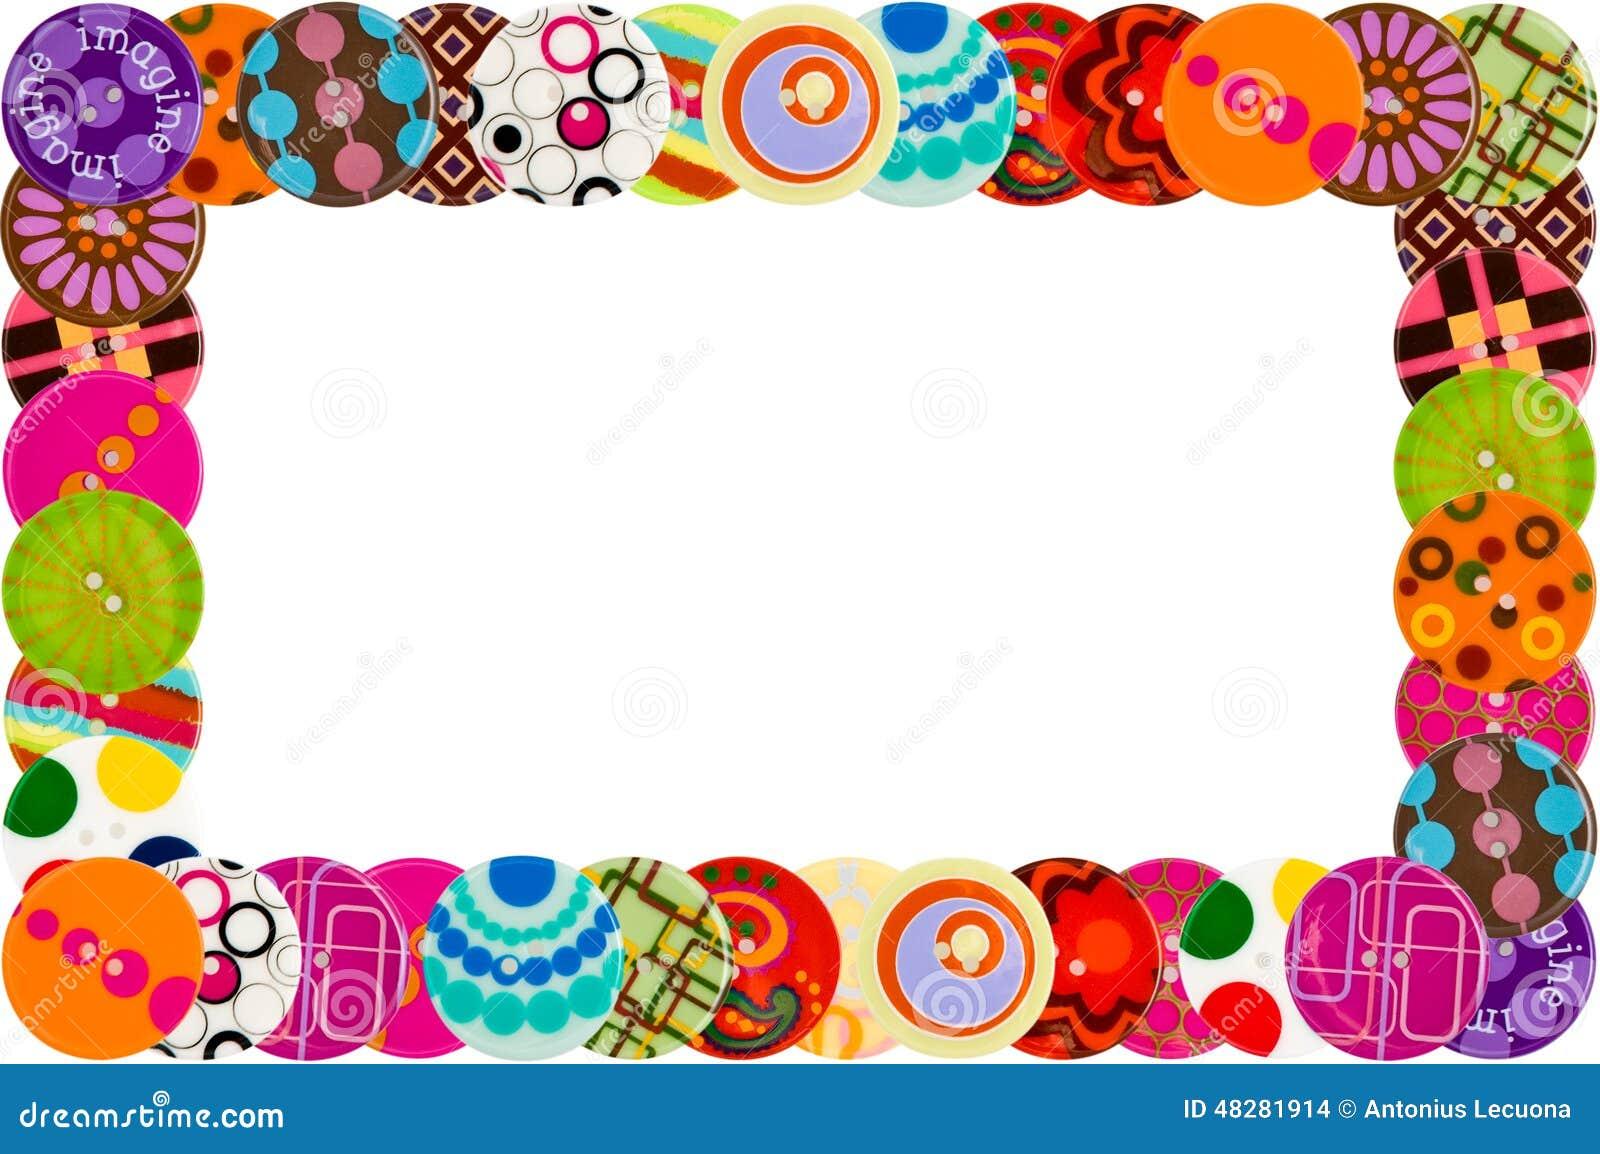 Funky button frame stock illustration. Illustration of borders ...